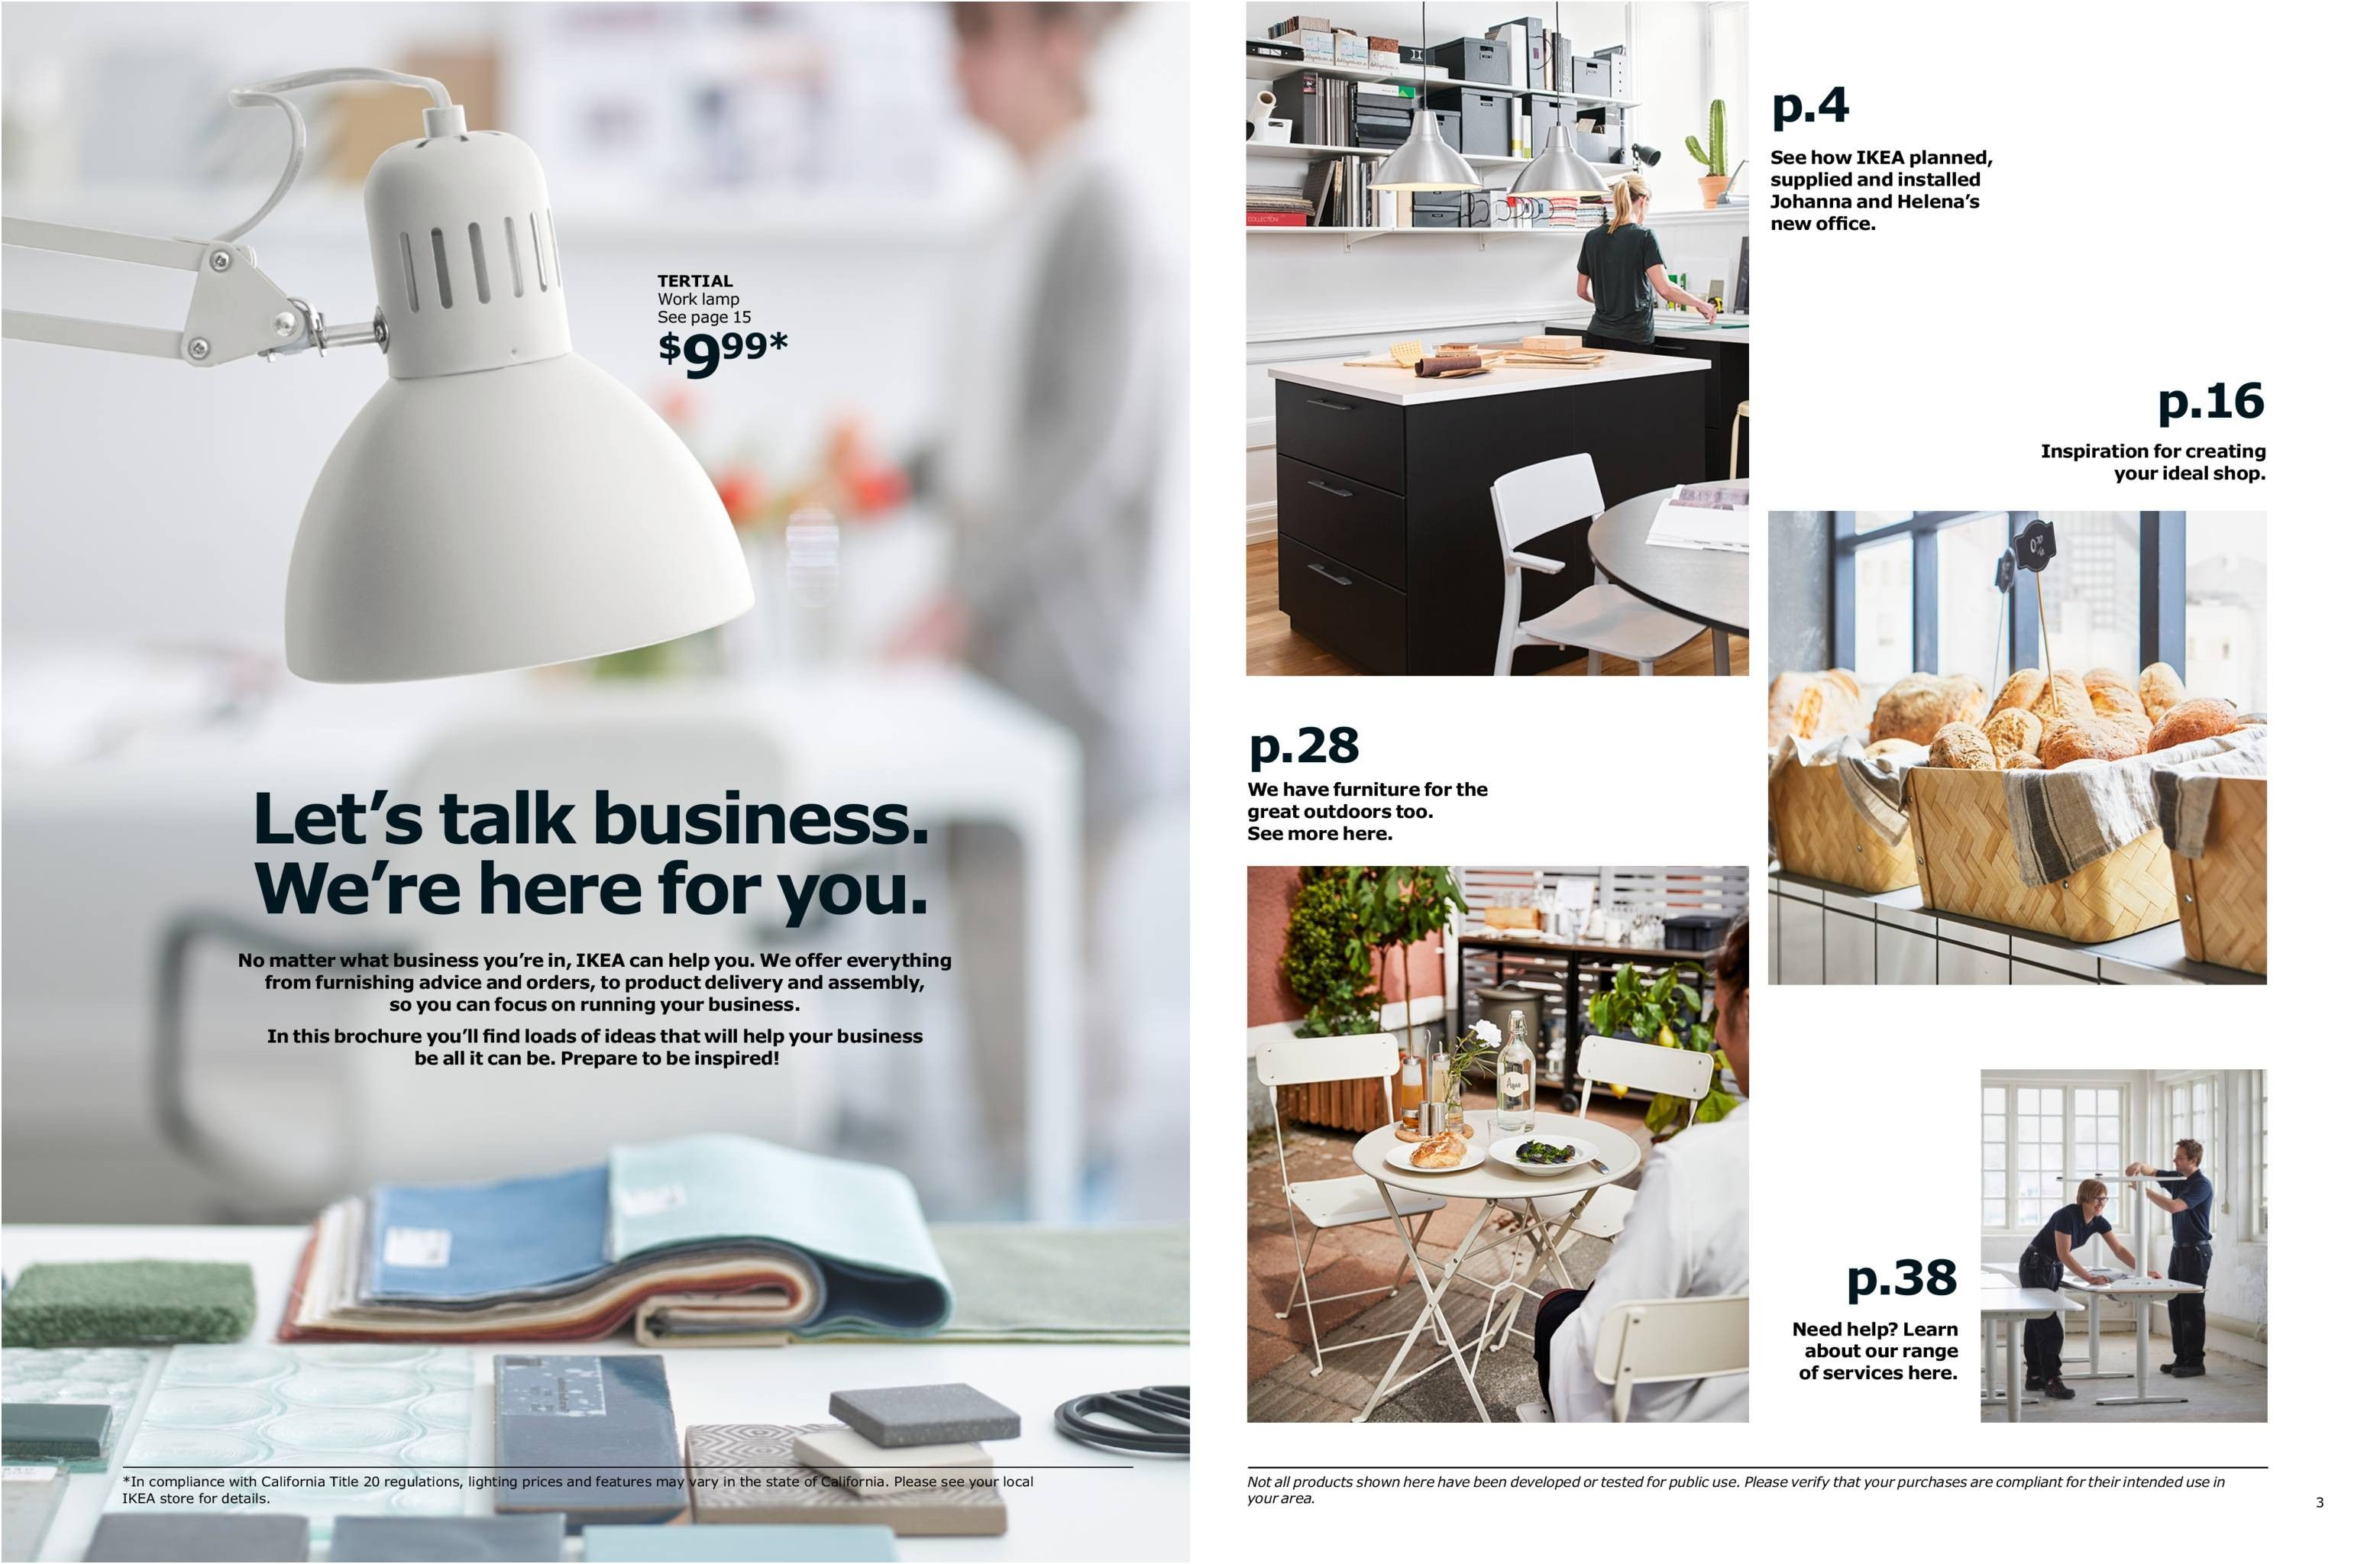 Wonnegul Ikea Deutschland Online In 2020 Ikea Catalog Ikea Business